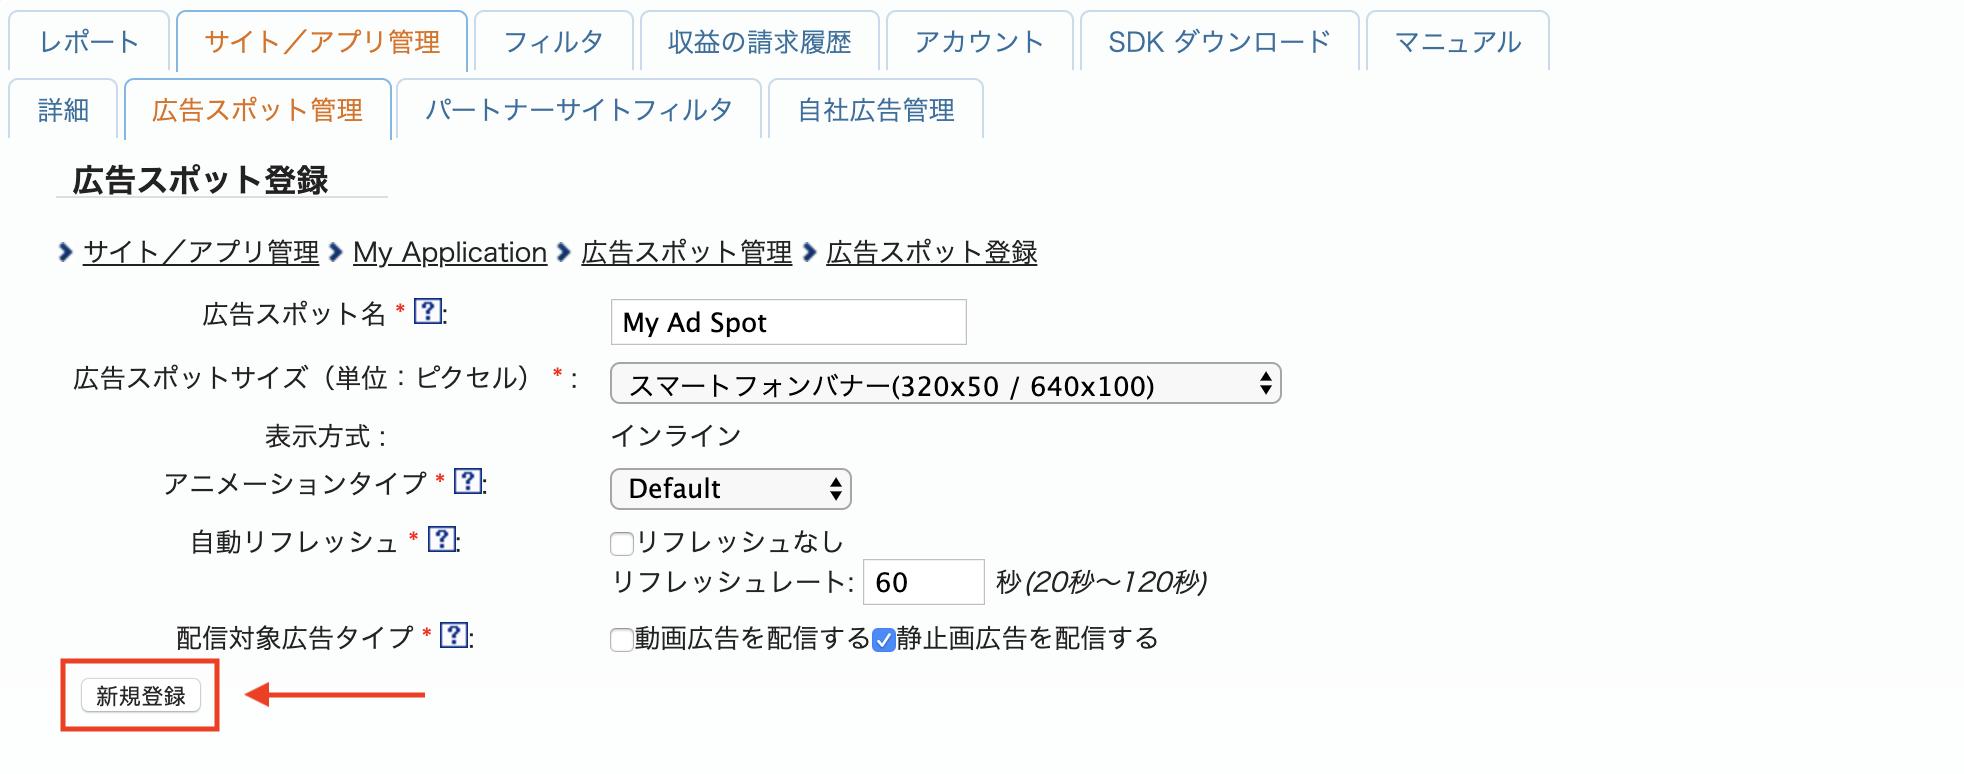 new_ad_spot_form